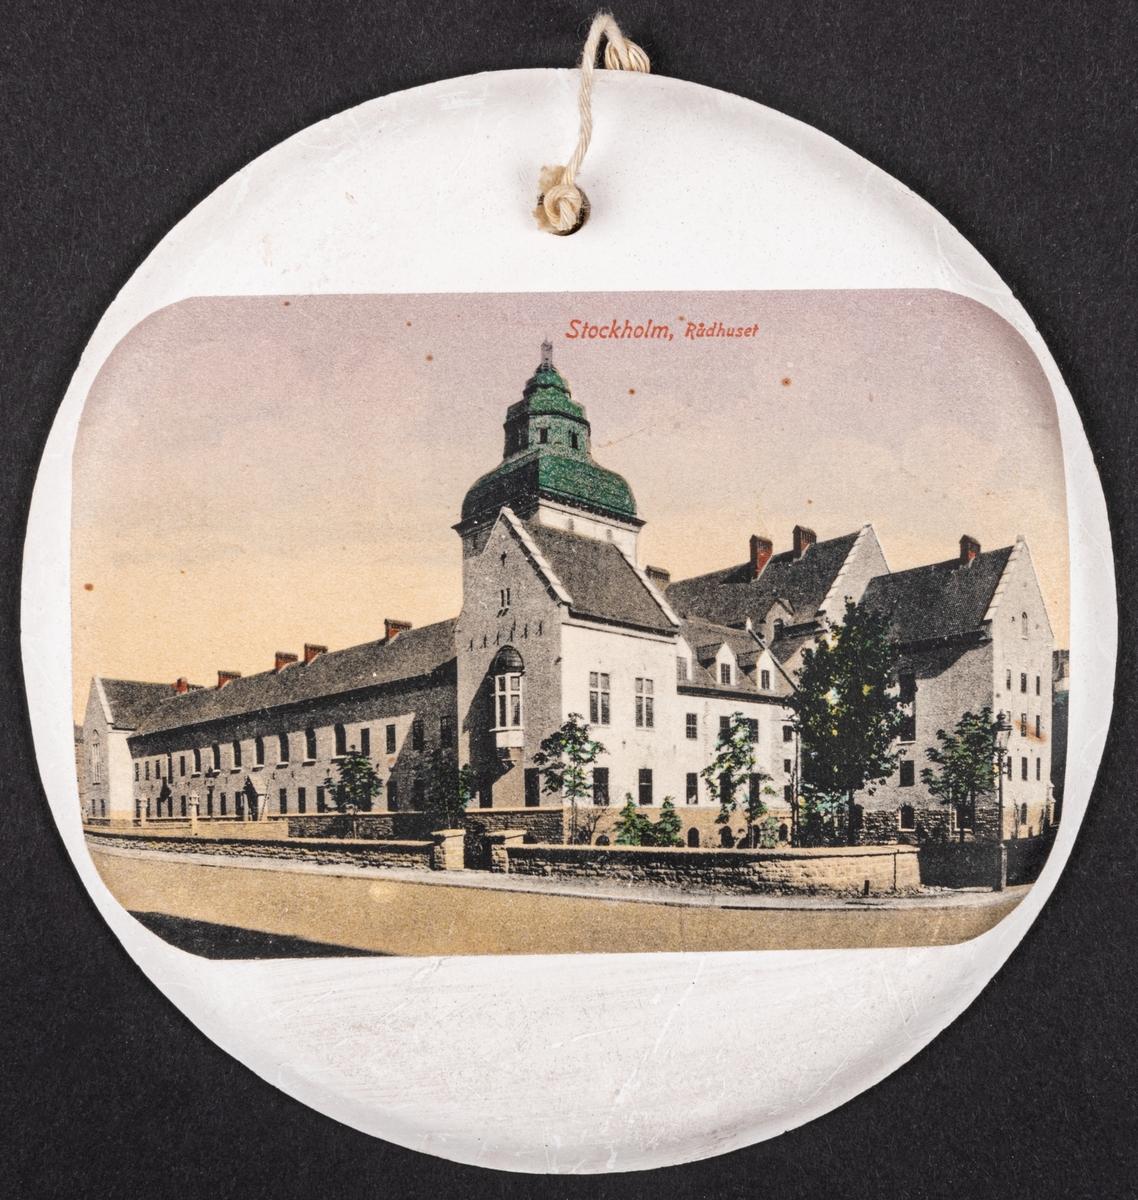 Gipsplatta med Stockholms rådhus.